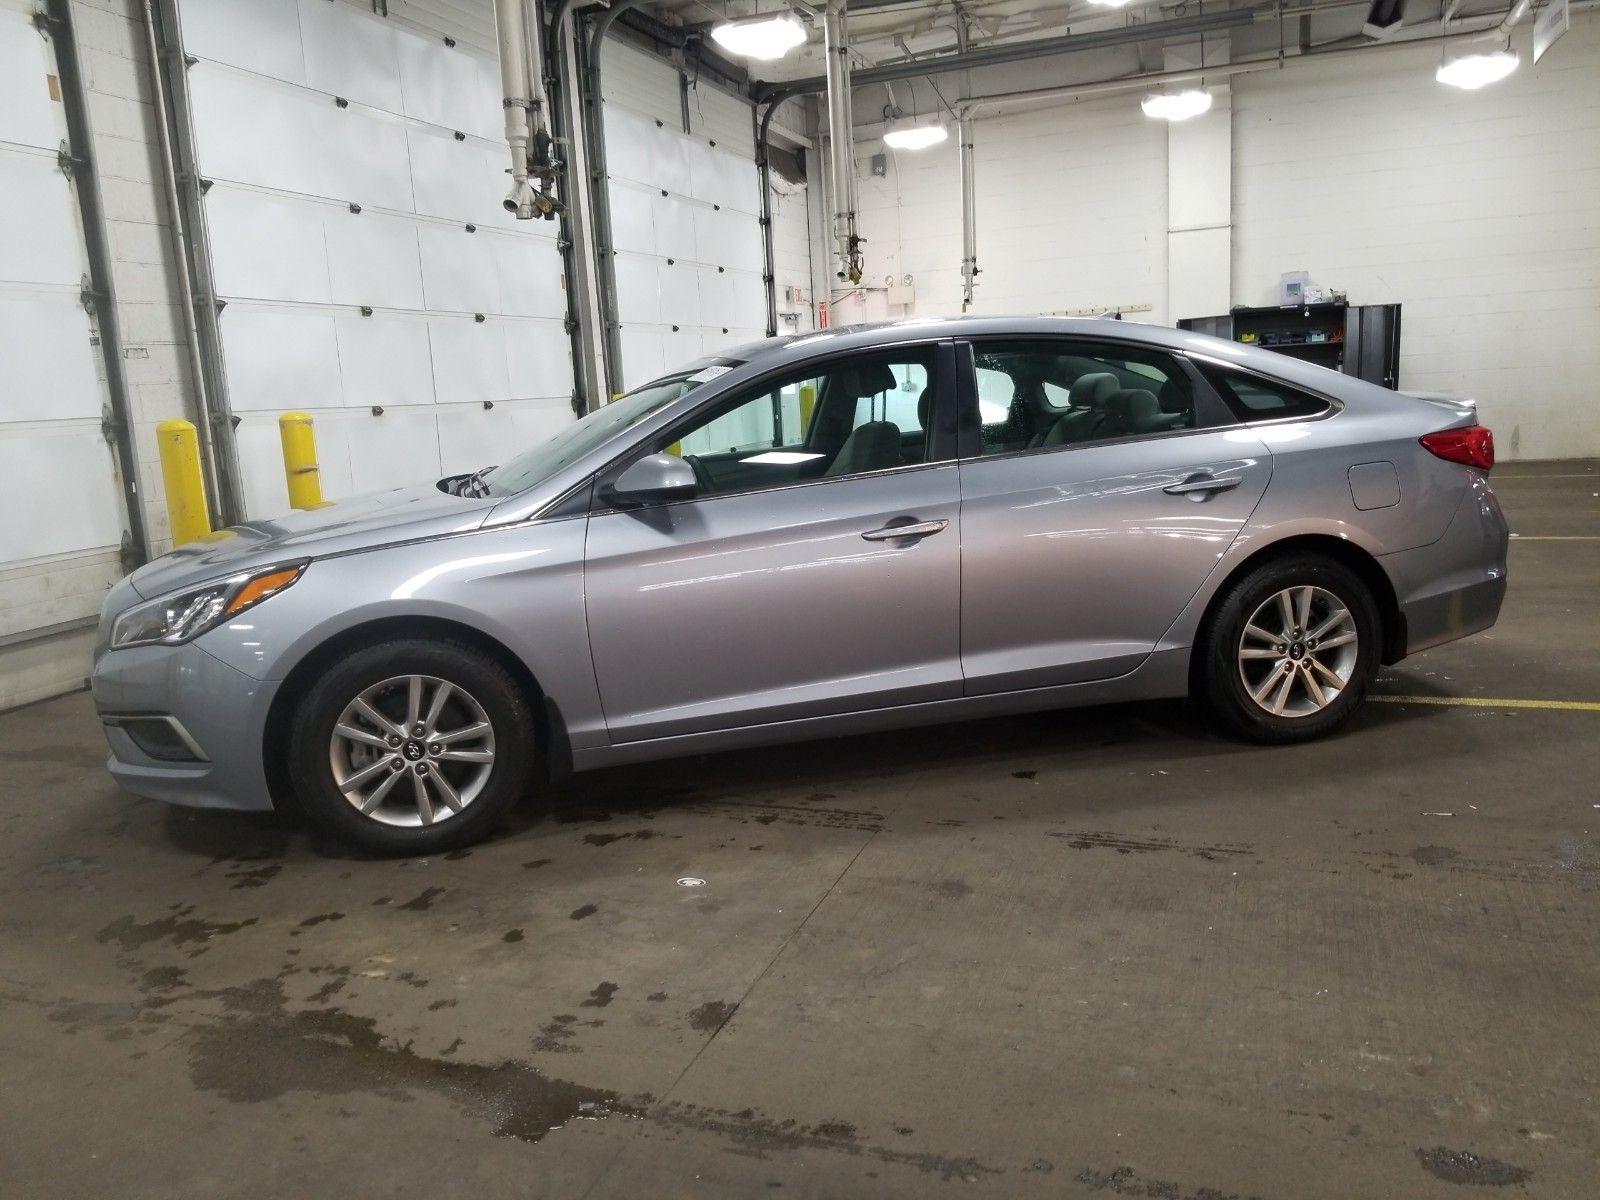 2017 Hyundai Sonata 2.4. Lot 99921075156 Vin 5NPE24AF8HH453386